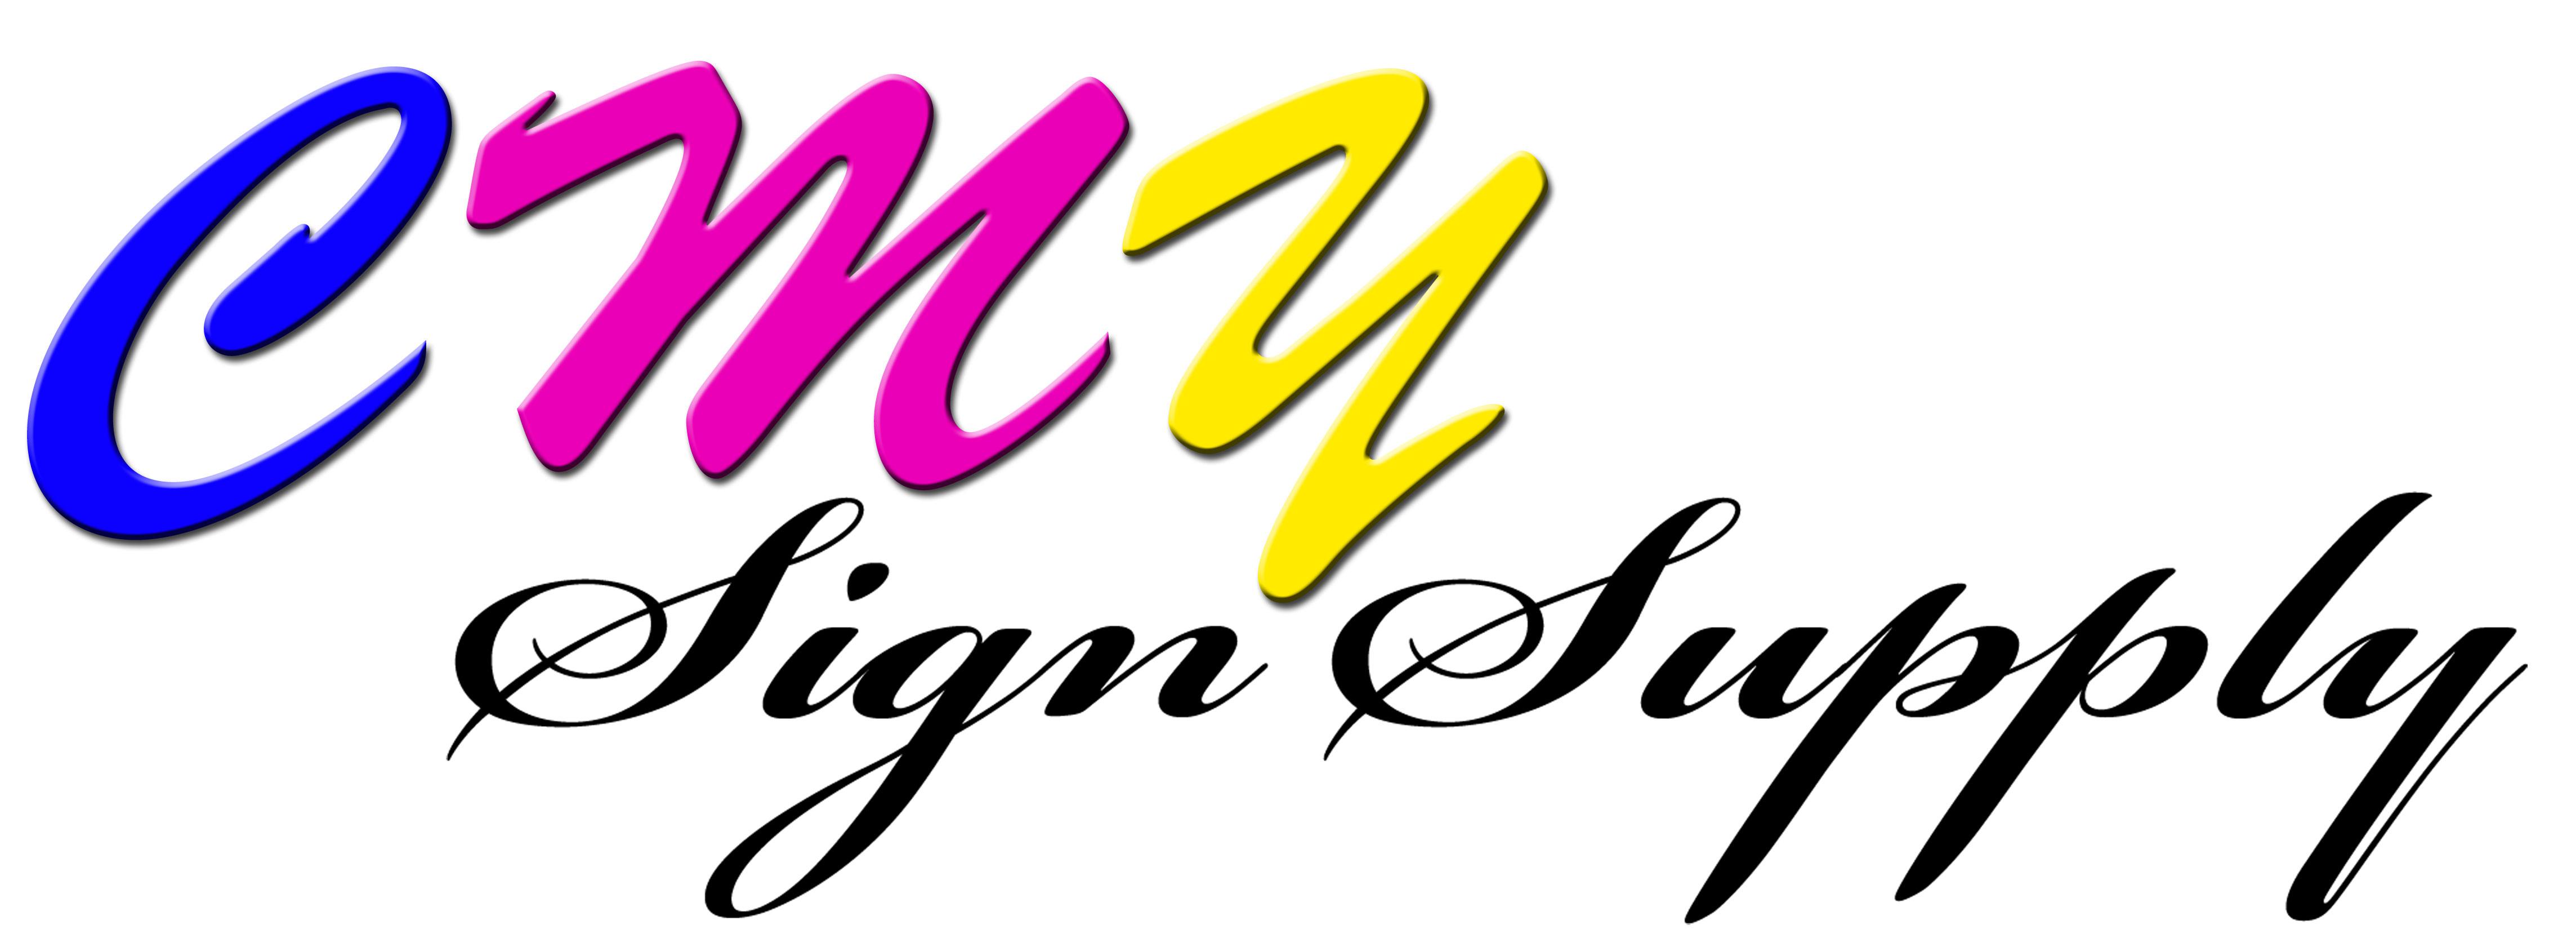 Cmy Image Wide Format Printer Cartridges Supply Desk